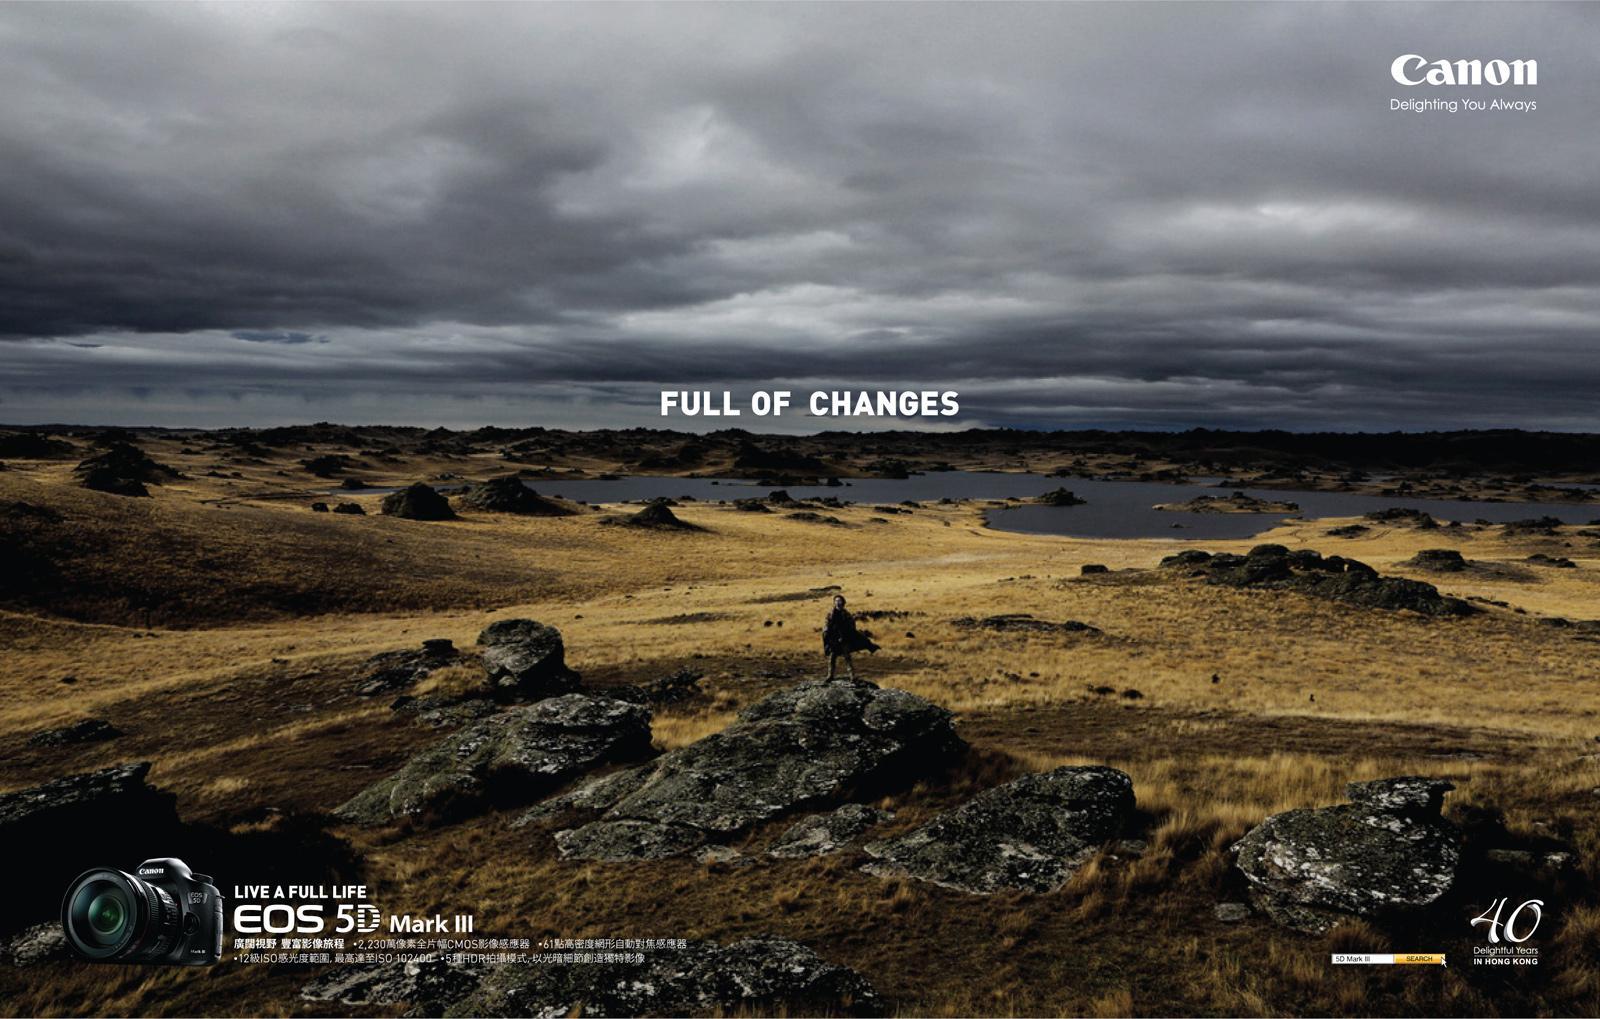 Canon Print Ad -  Live A Full Life, Version A